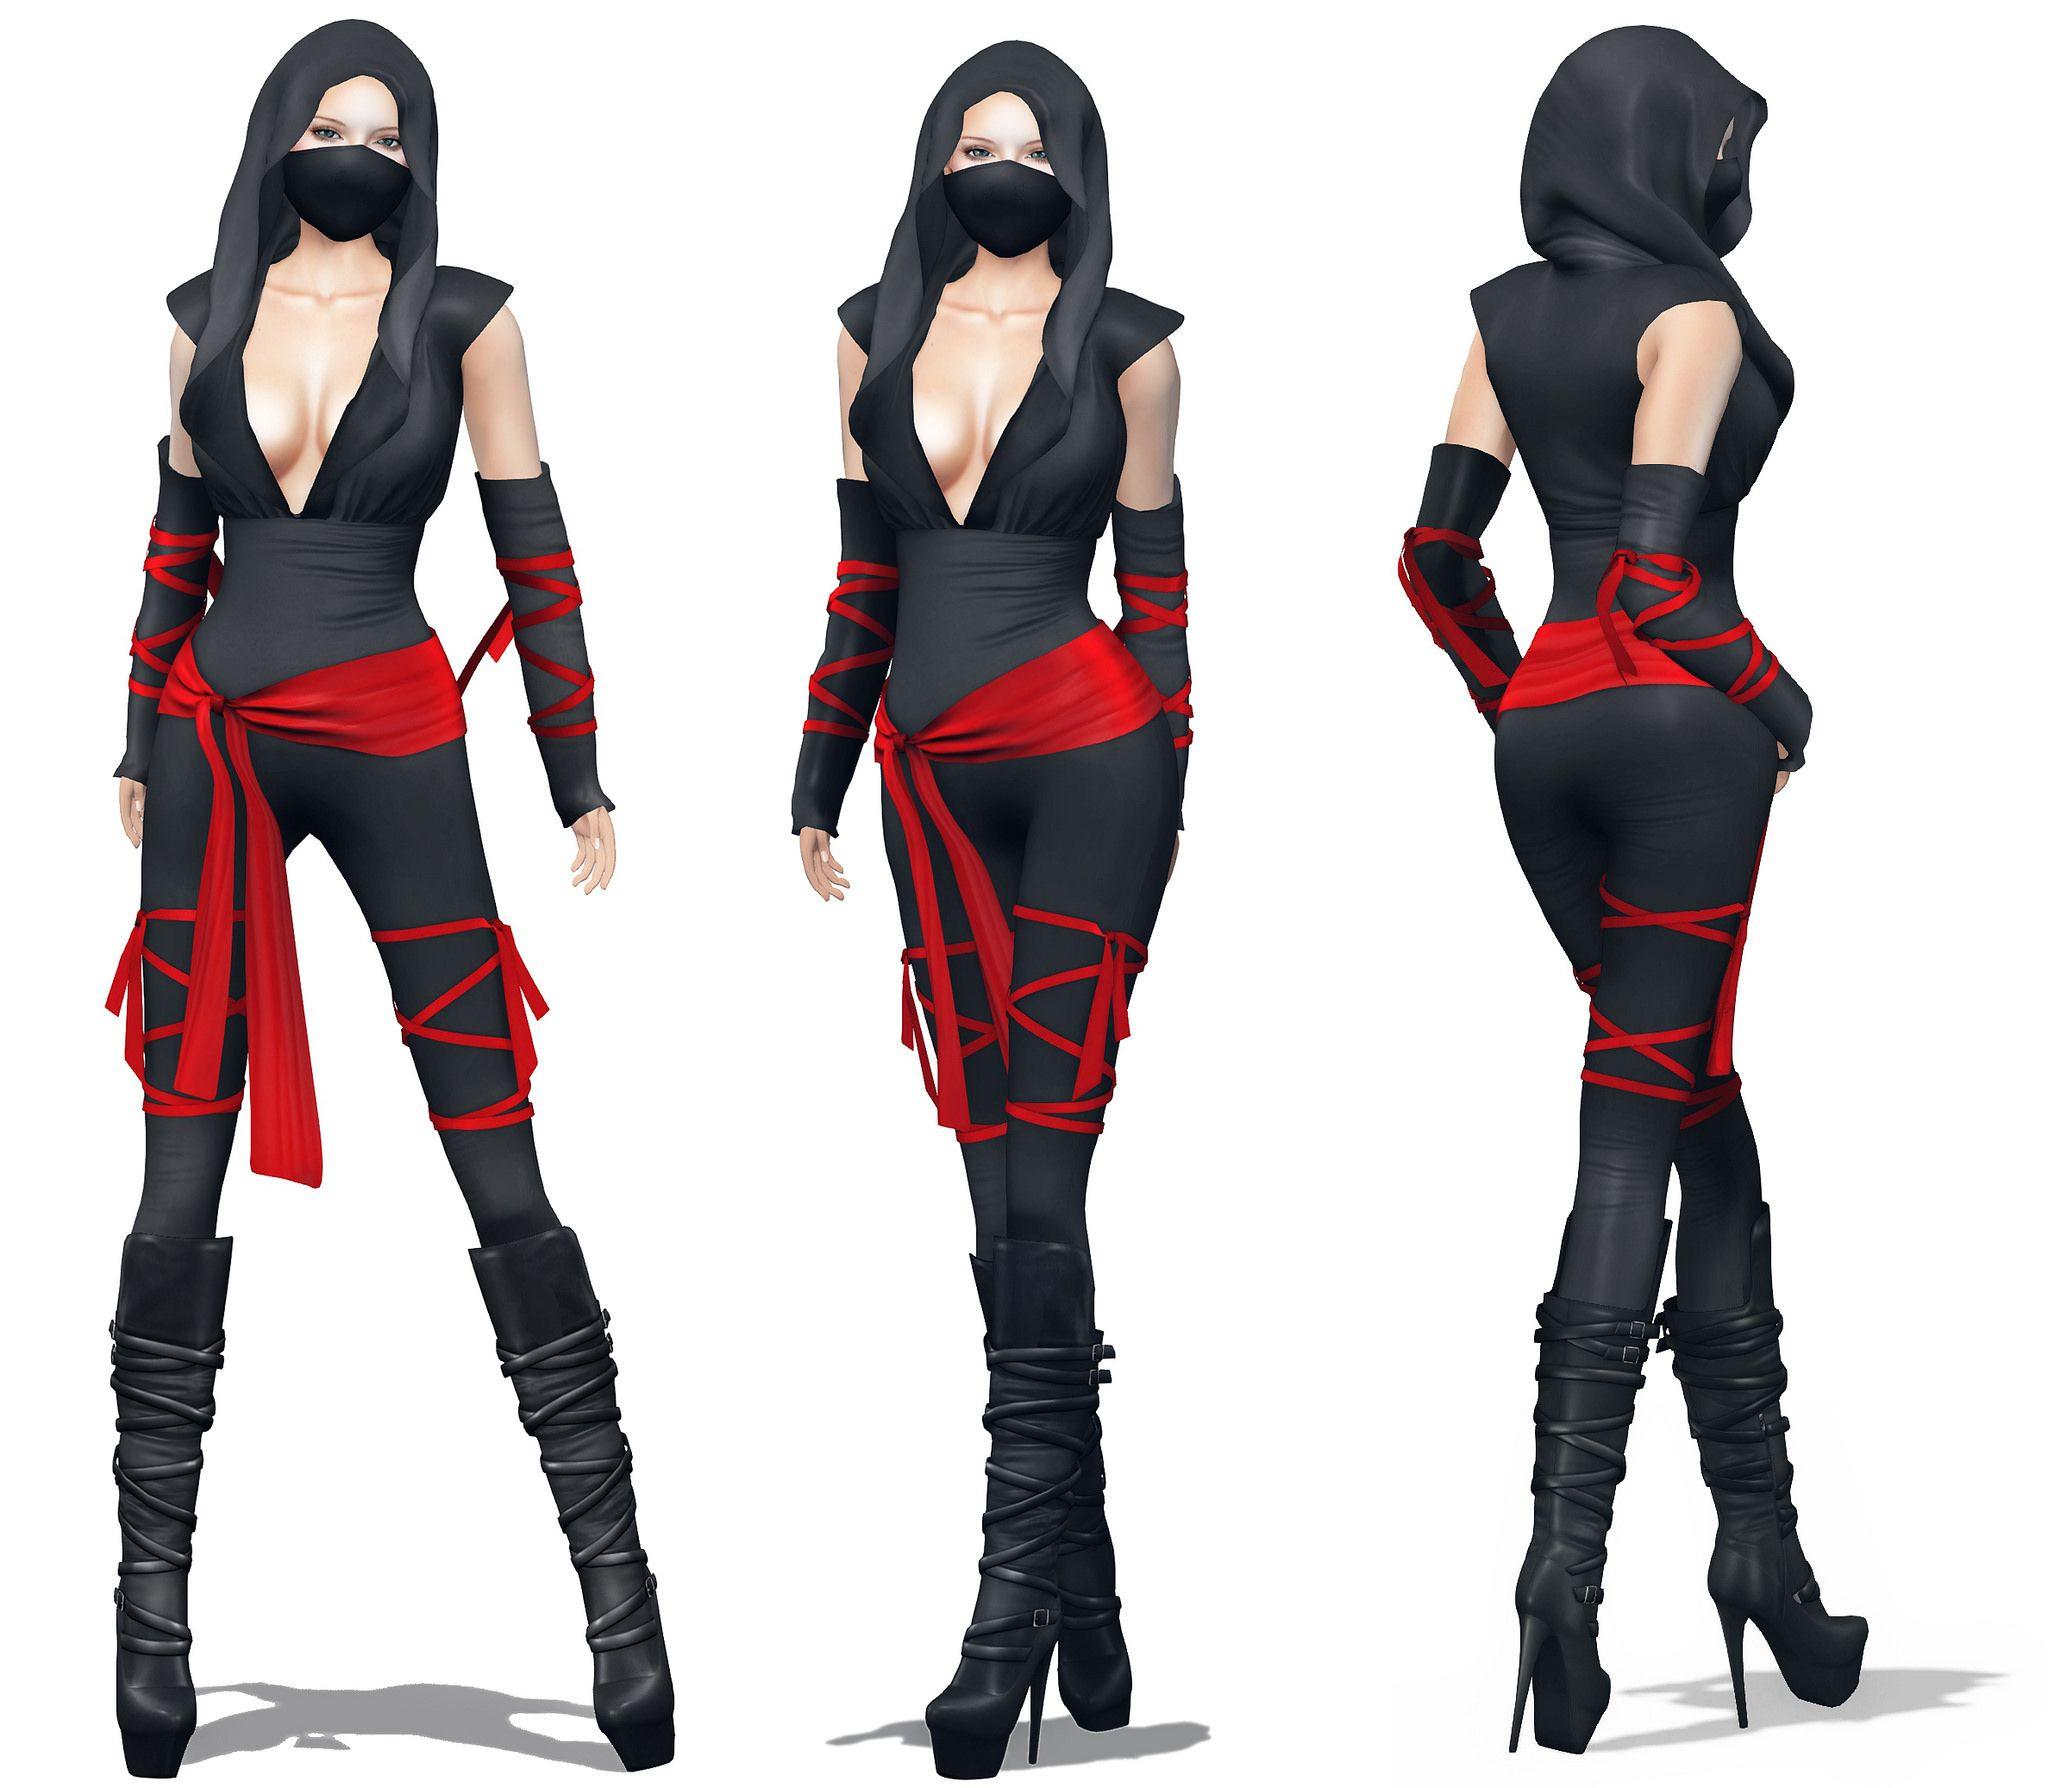 Female Ninja Costume DIY  Womens Ninja Costume